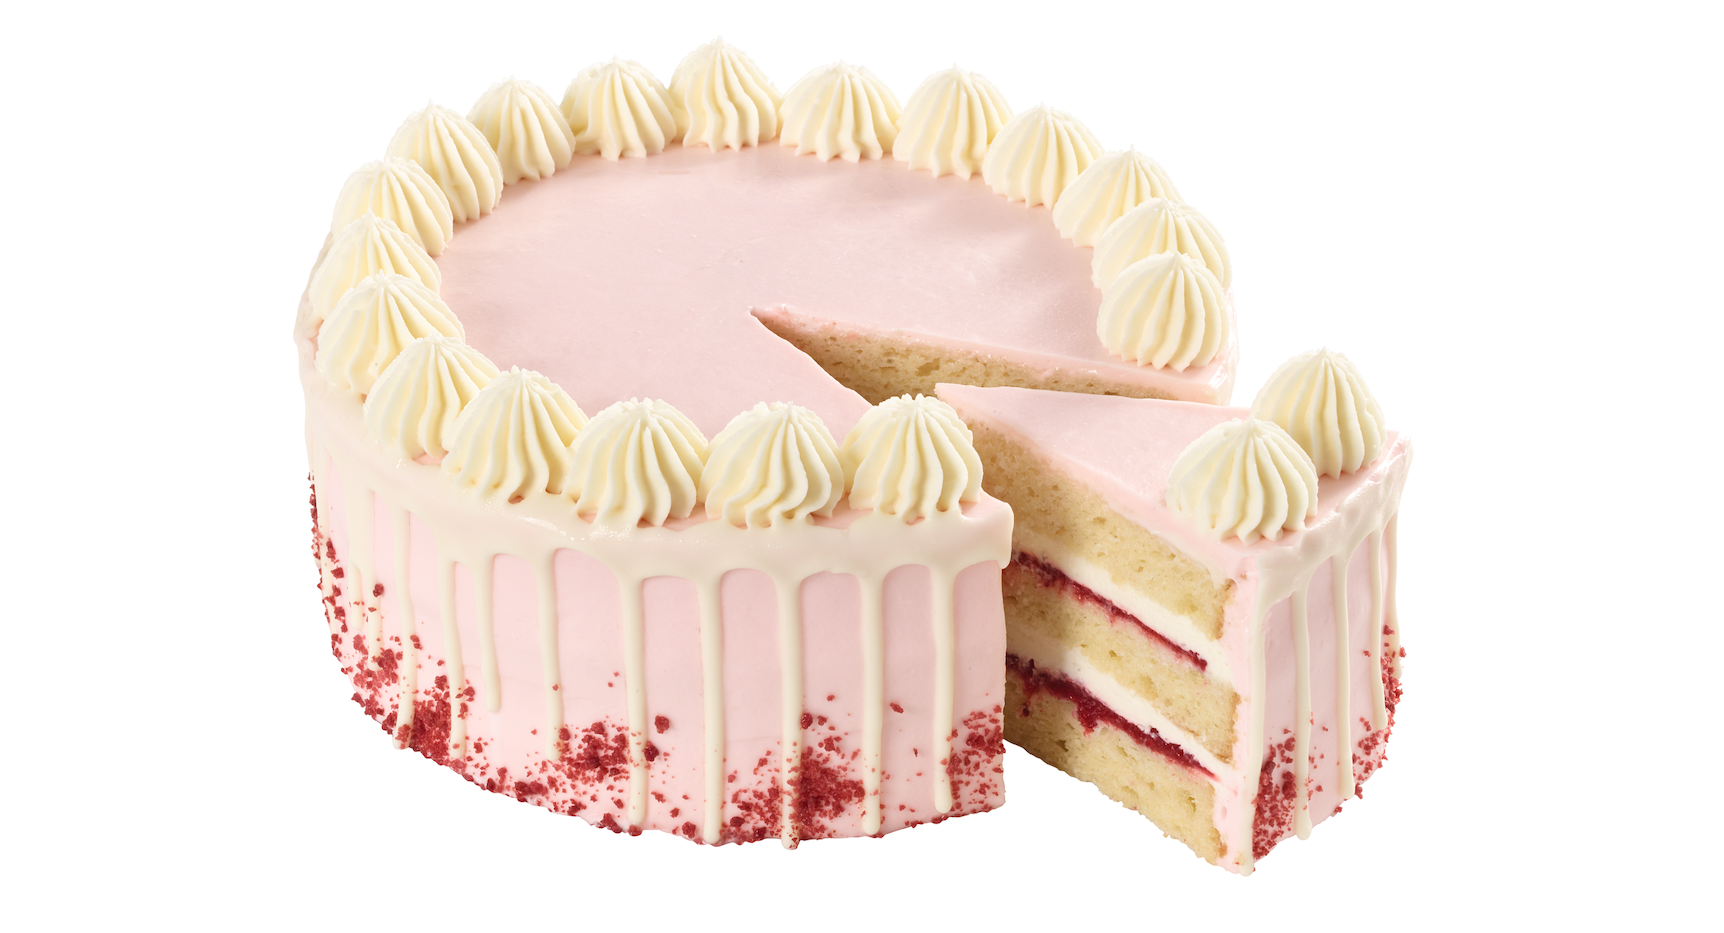 Rasberry White Chocolate.png